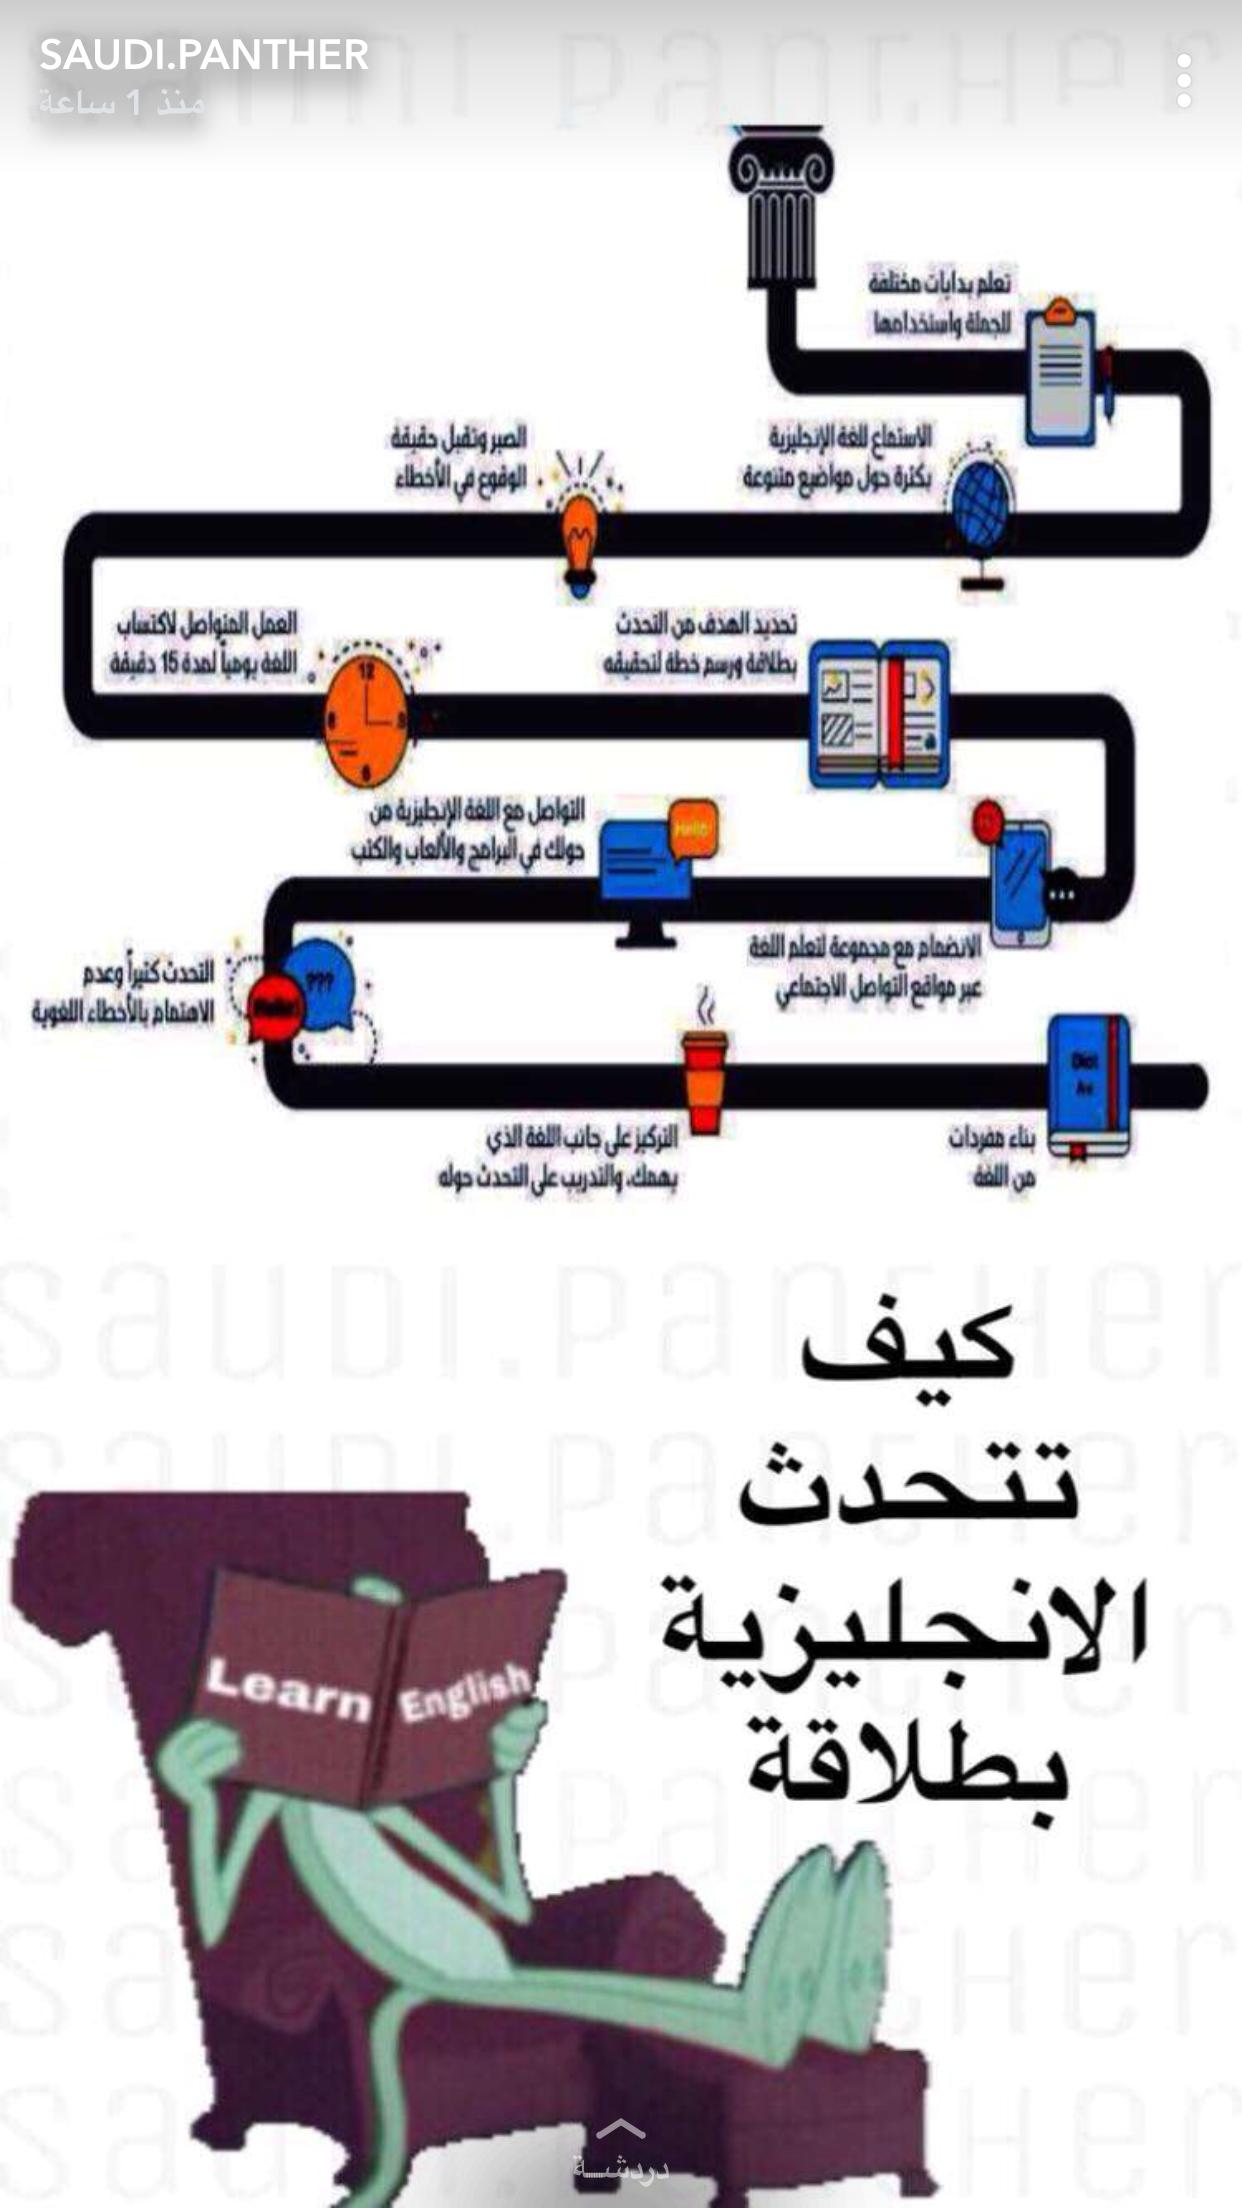 Language Learn English Vocabulary Learn English Words English Language Learning